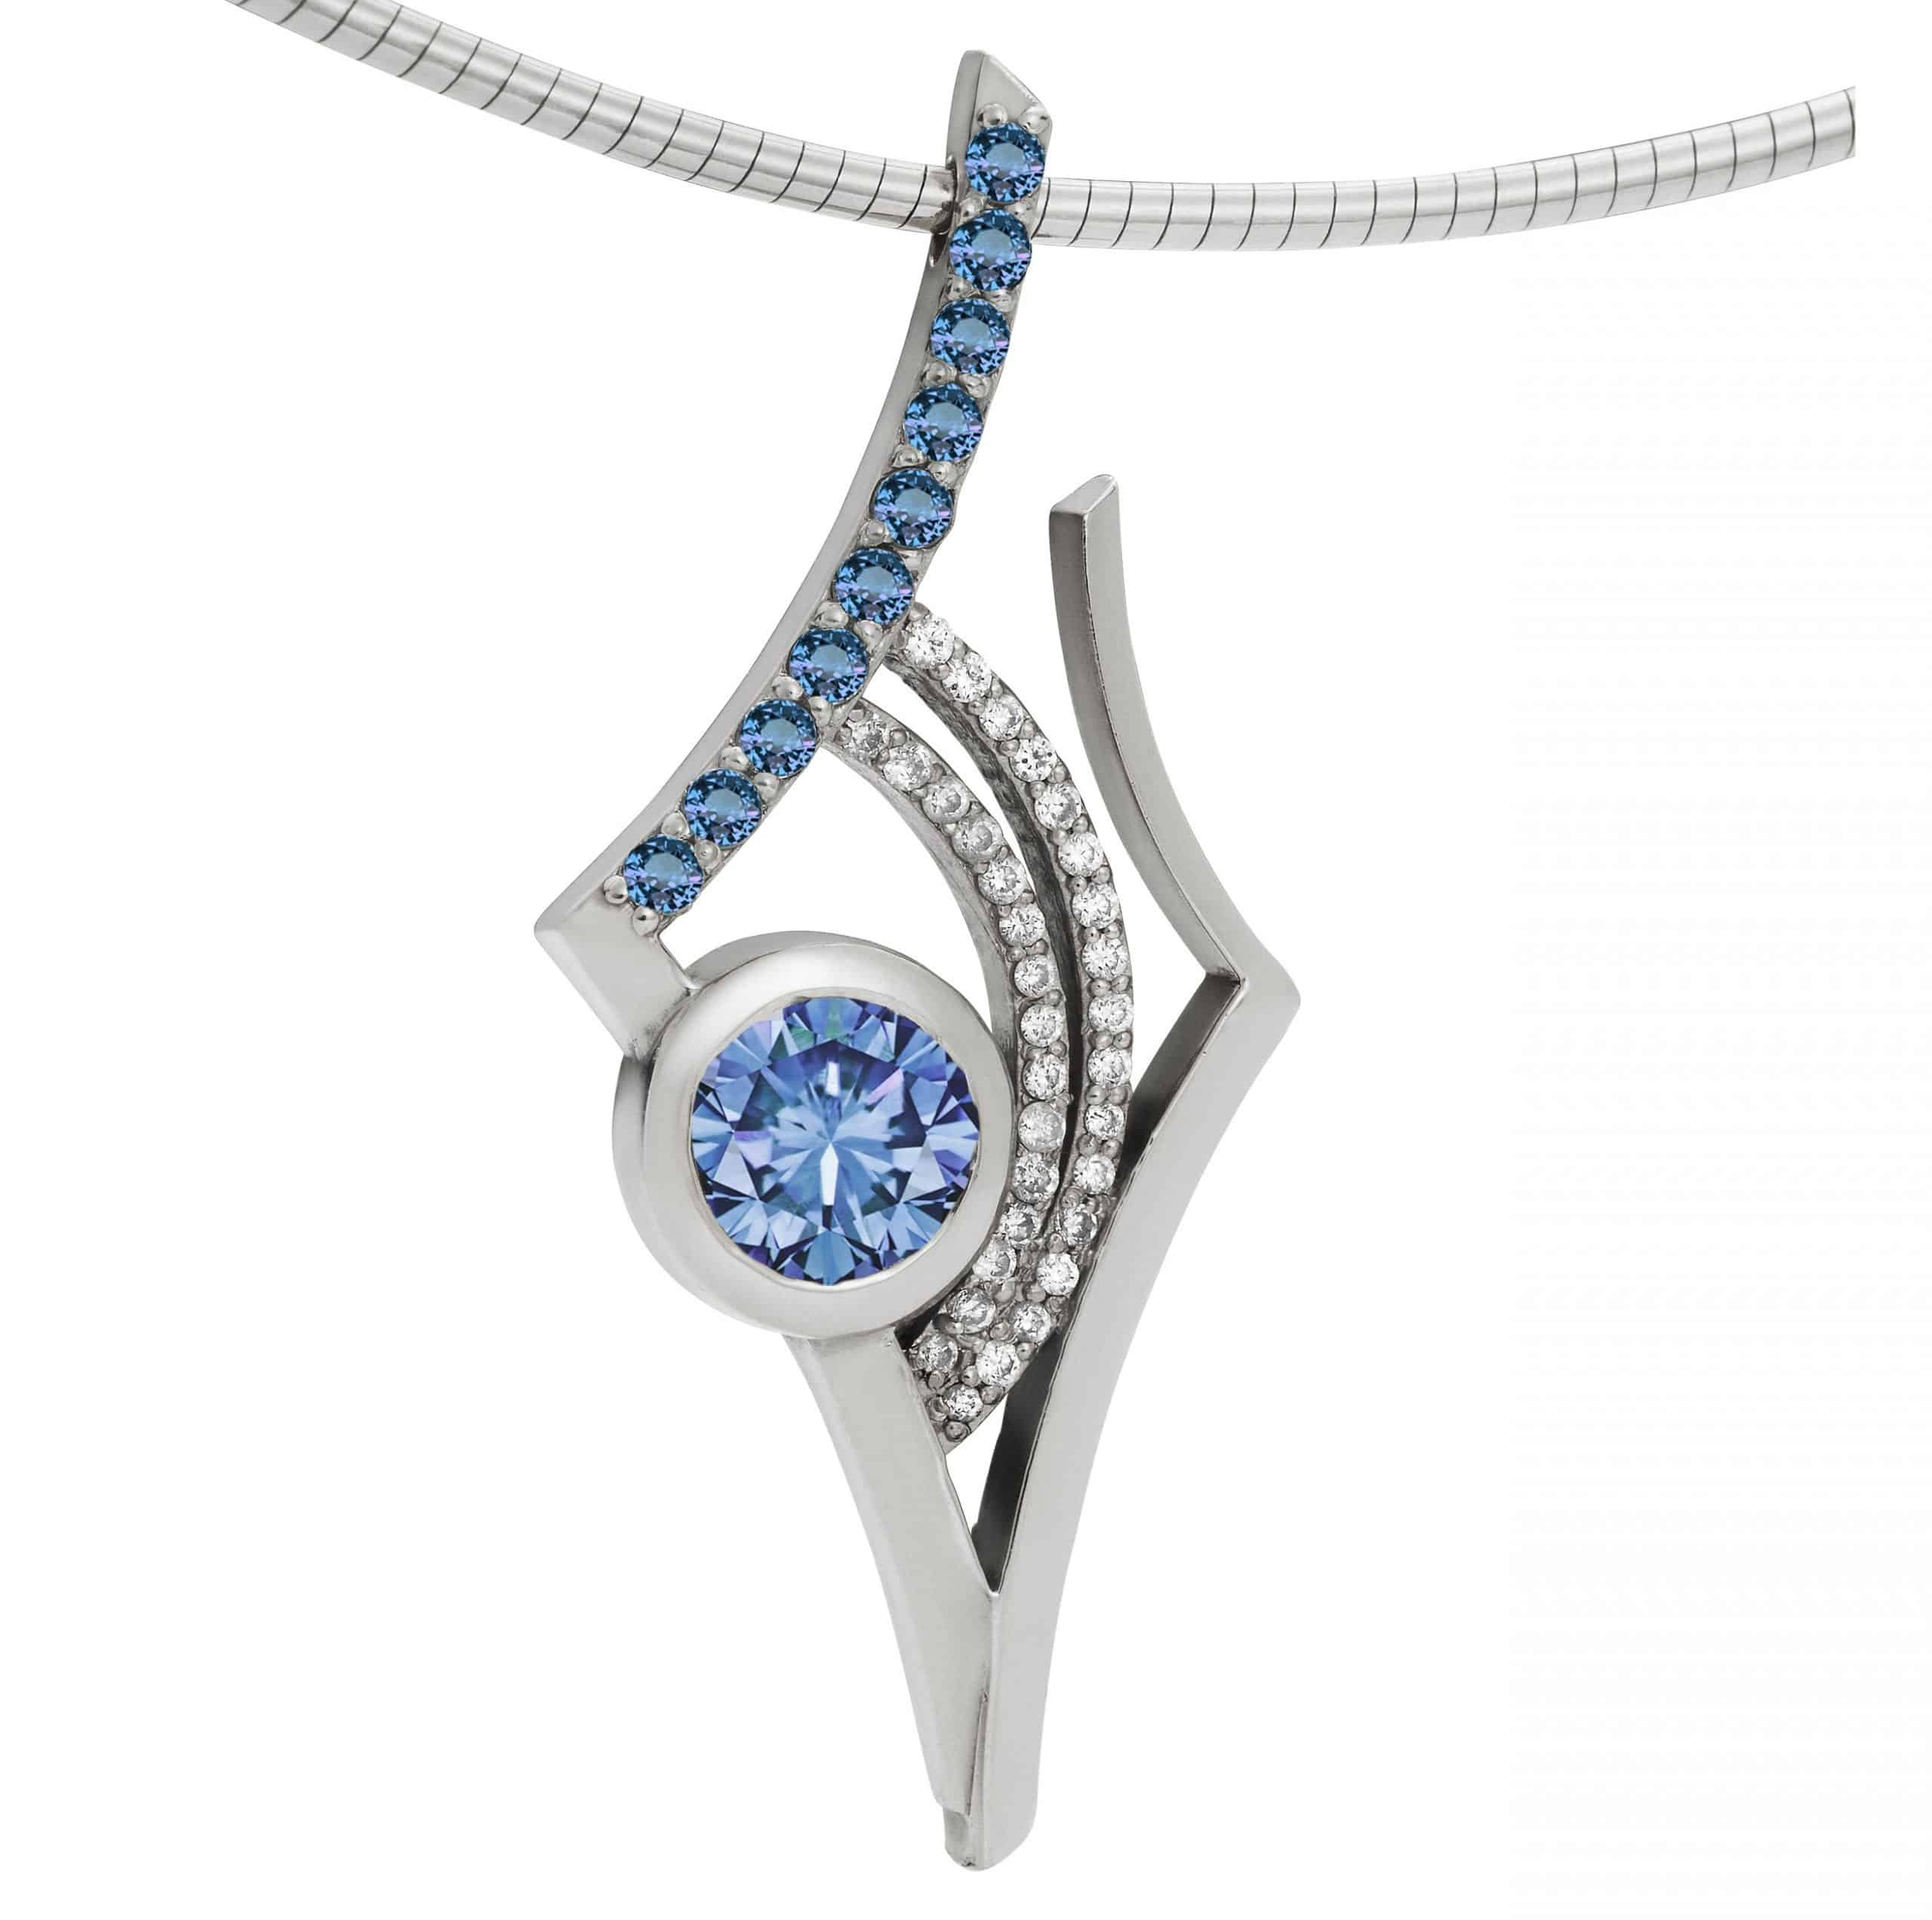 Martha Seely - Antares O - pendant blue and white topaz